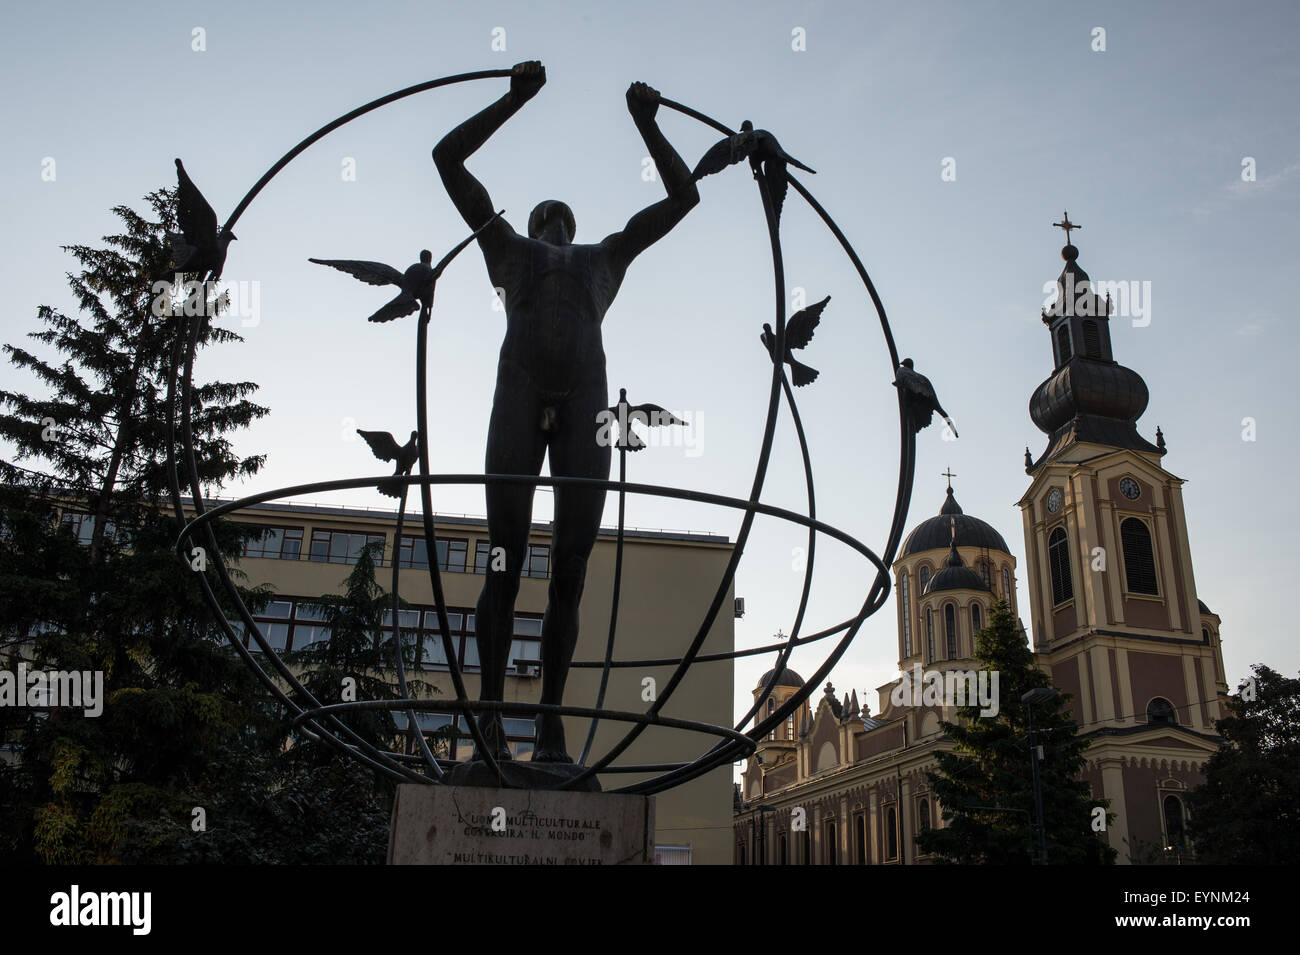 Friedensmonument, Barscarsija Bezirk, Sarajevo, Bosnien und Erzegovina Stockfoto